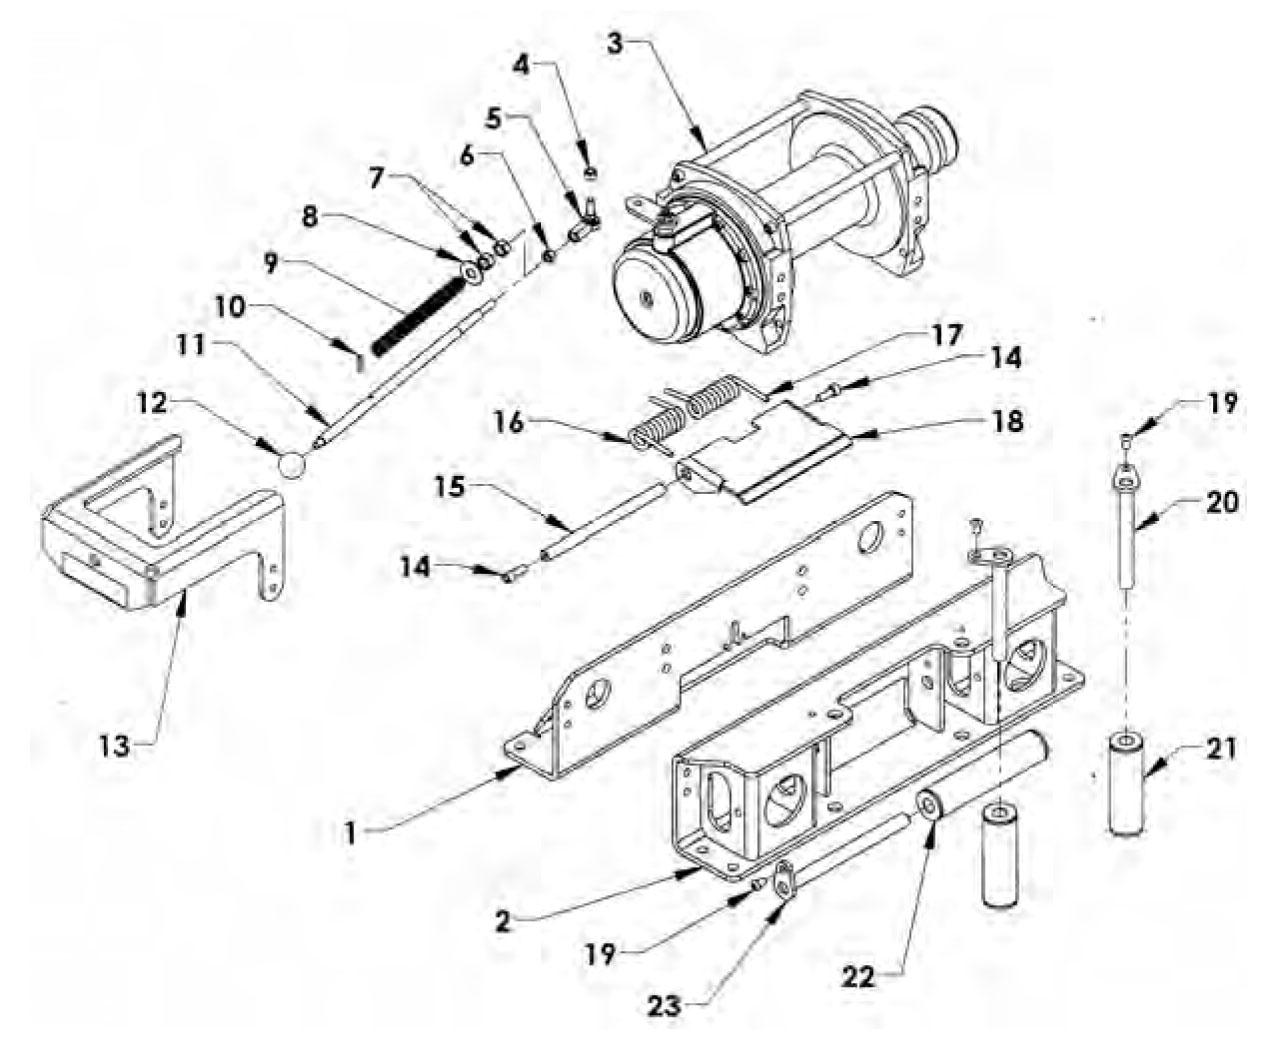 Great warn xd9000 wiring diagram gallery wiring diagram ideas